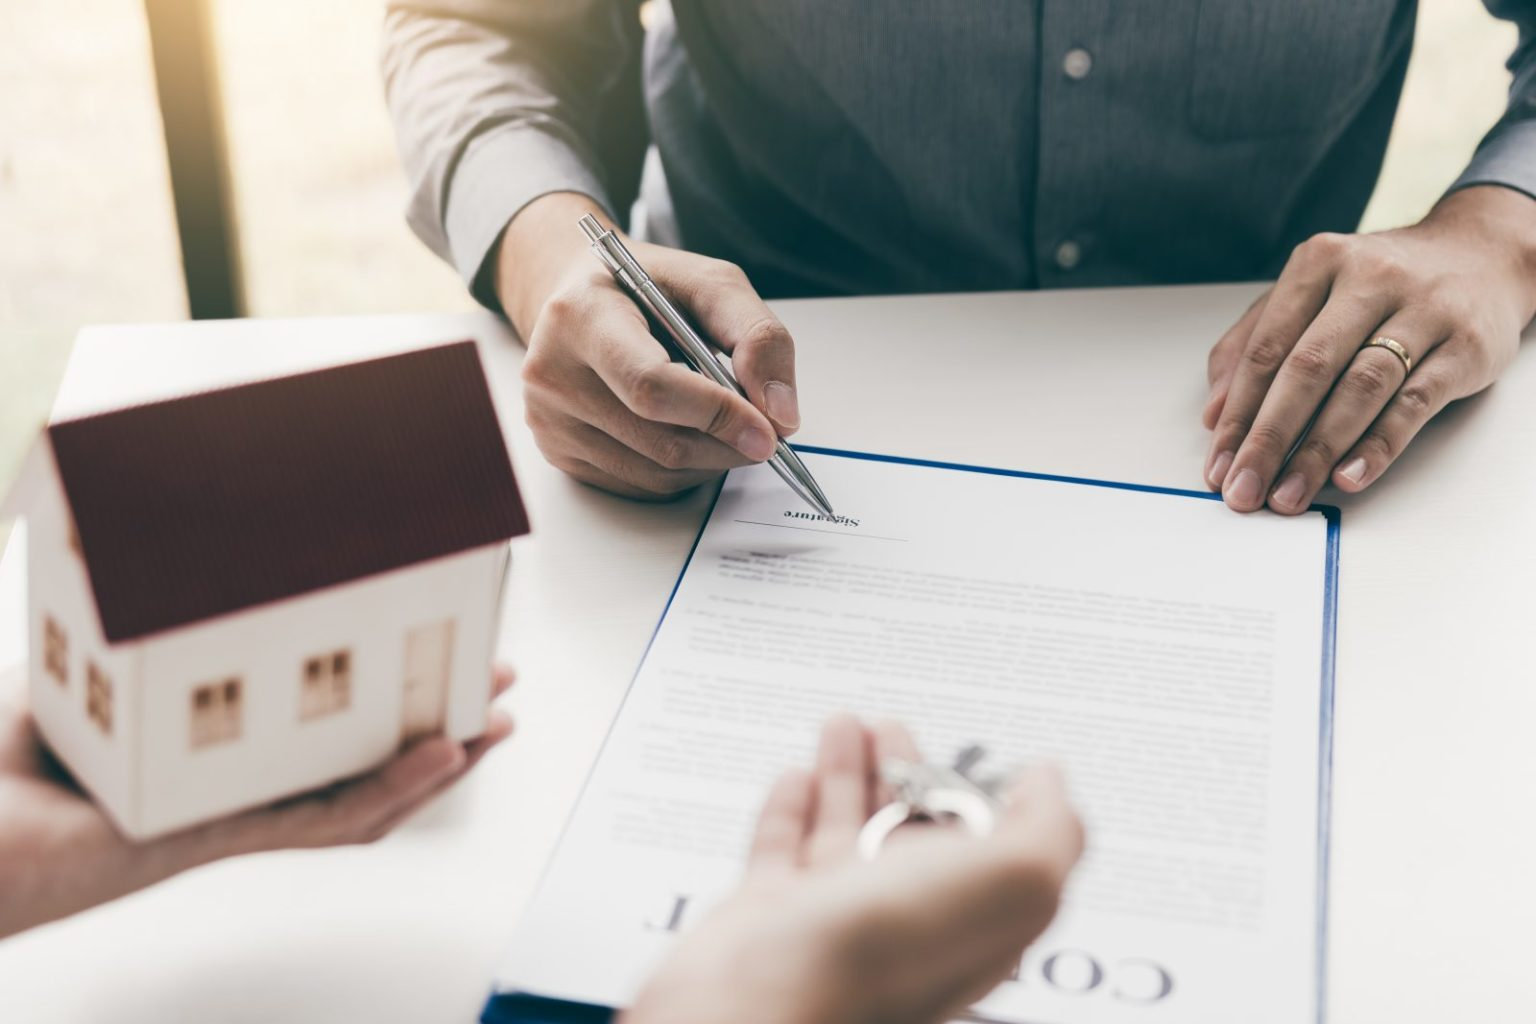 ¿Abrir una franquicia inmobiliaria o montar una inmobiliaria?